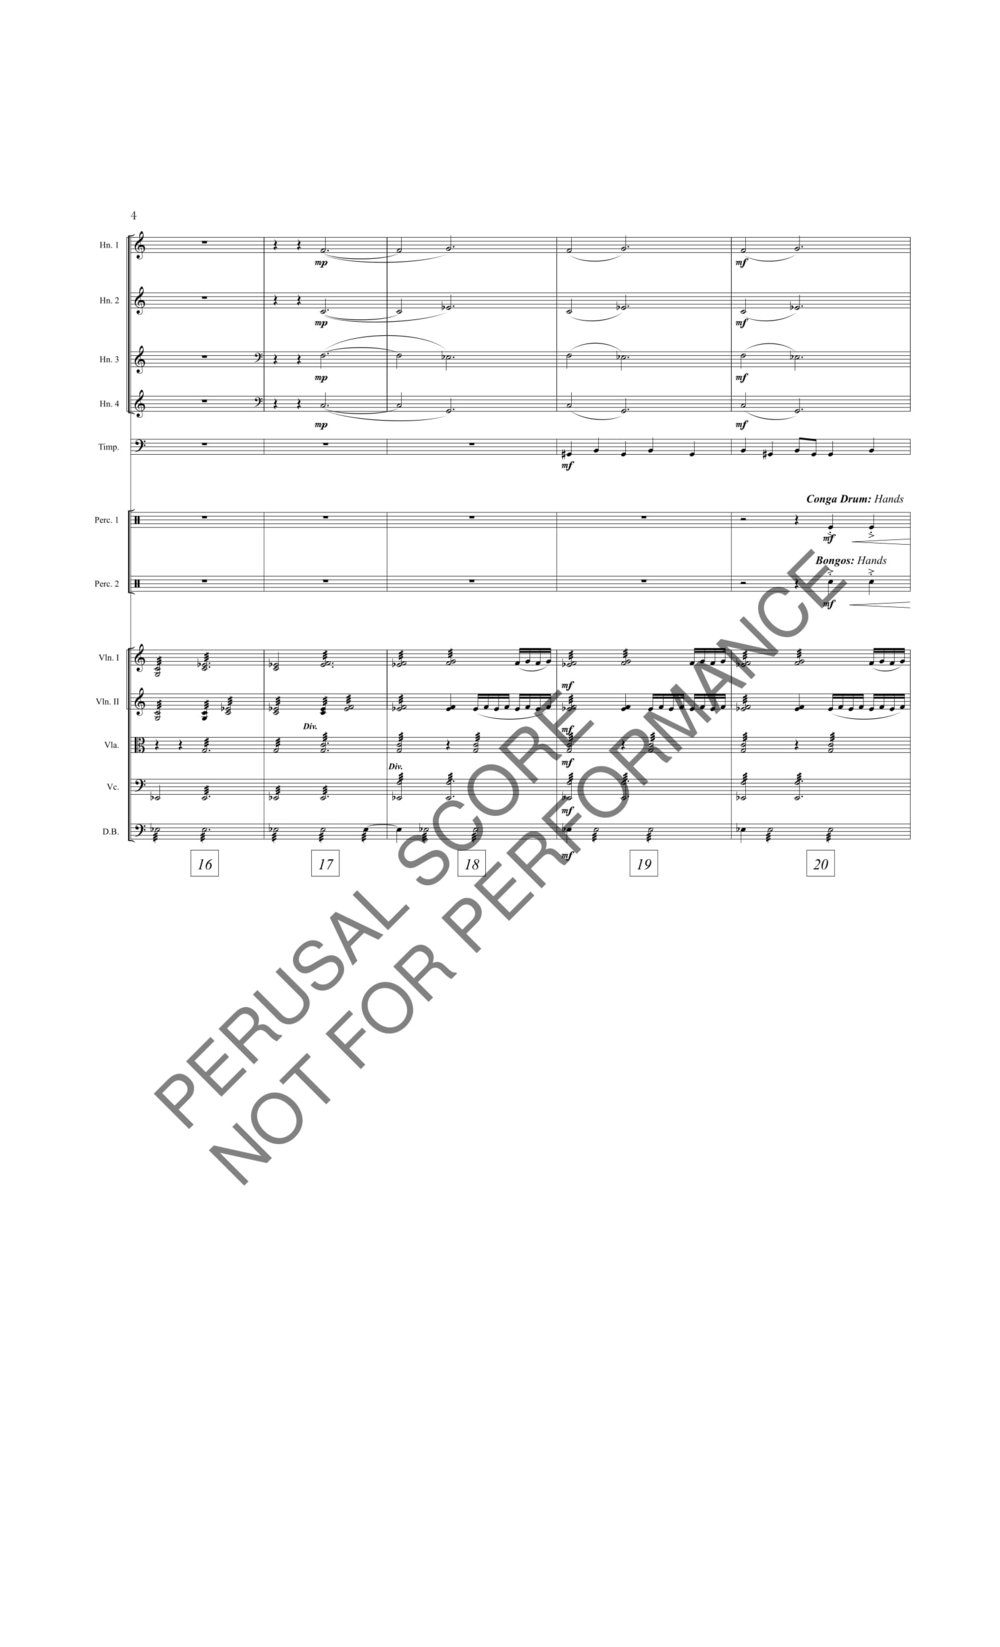 Boyd HouseofFountains Score-watermark-10.jpg